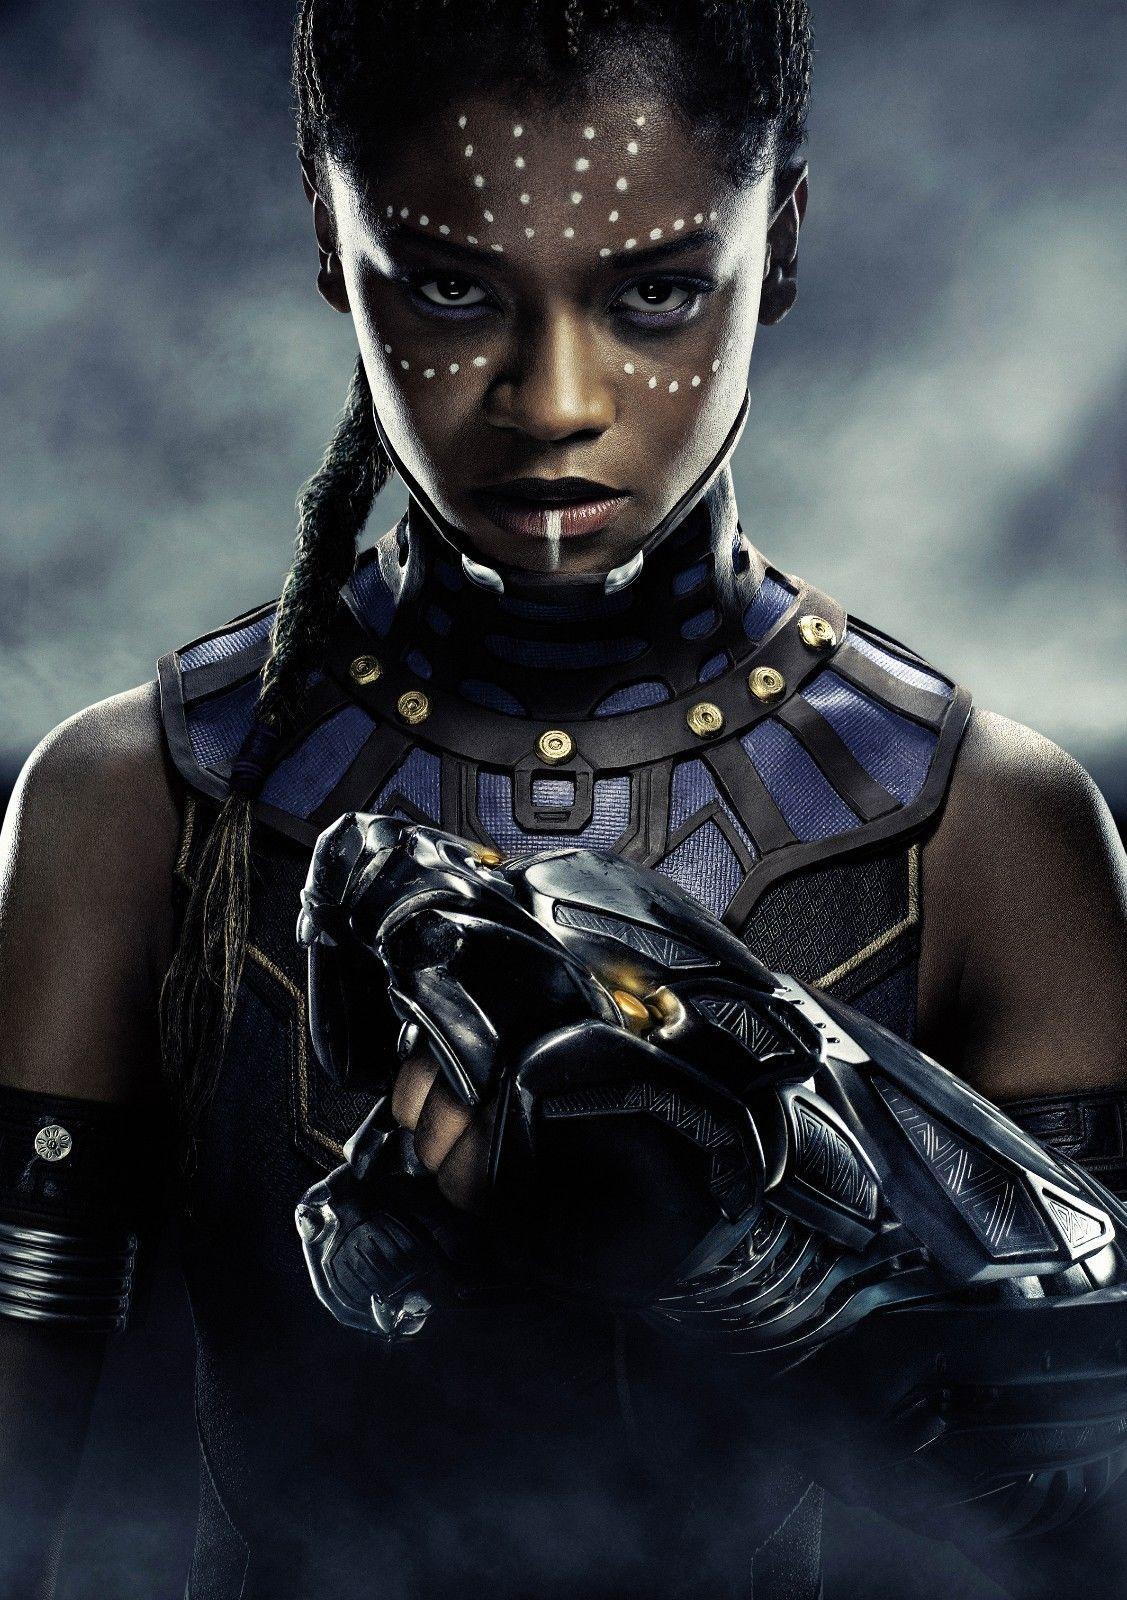 Black Panther Movie Lupita Nyong/'o as Nakia HQ Textless Poster 21×14 27×40 48×32